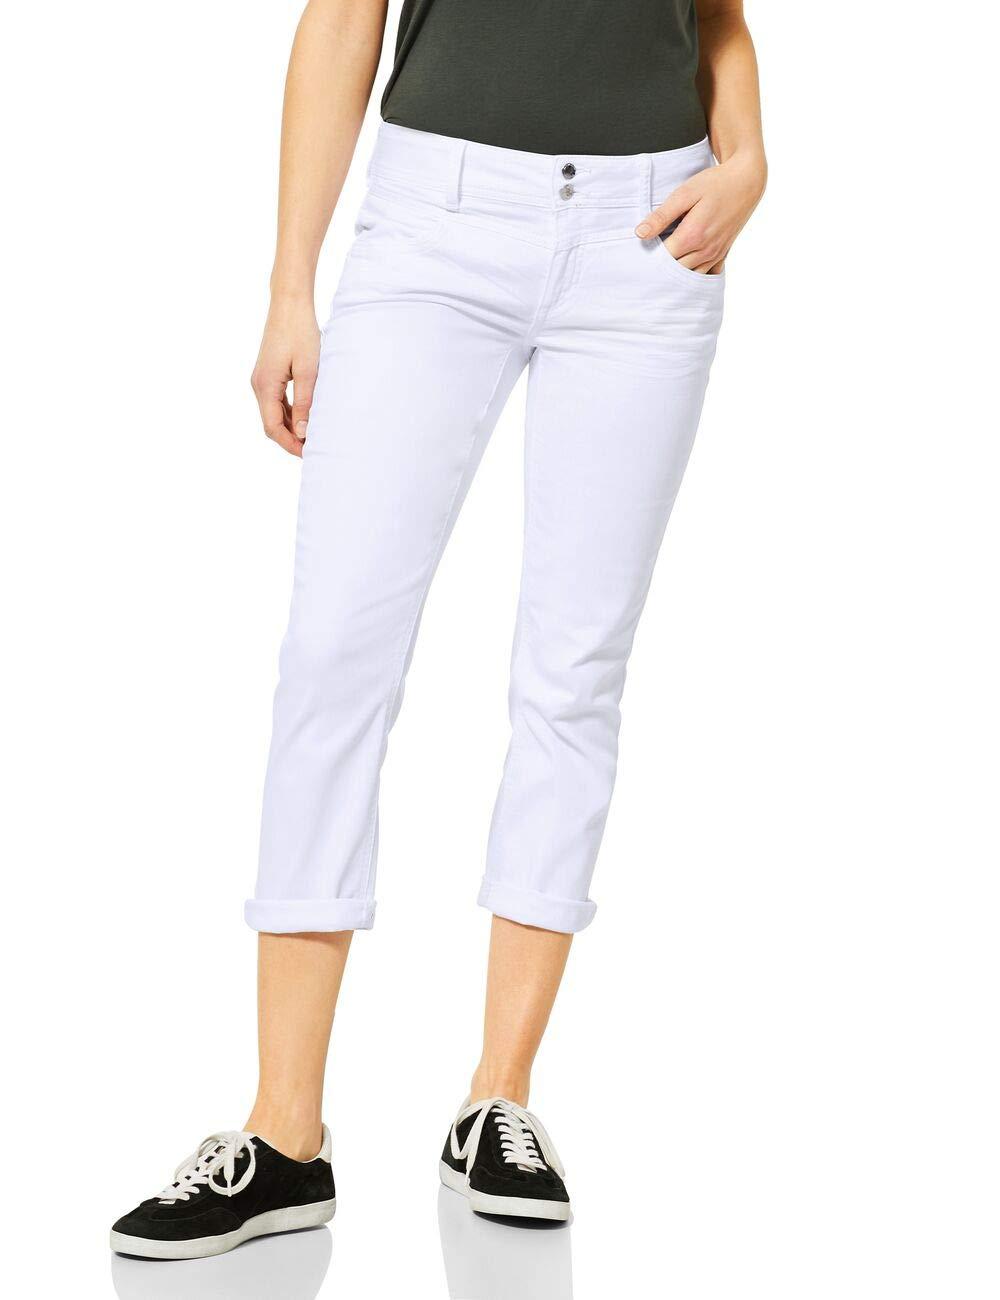 Jane Jeans Femme